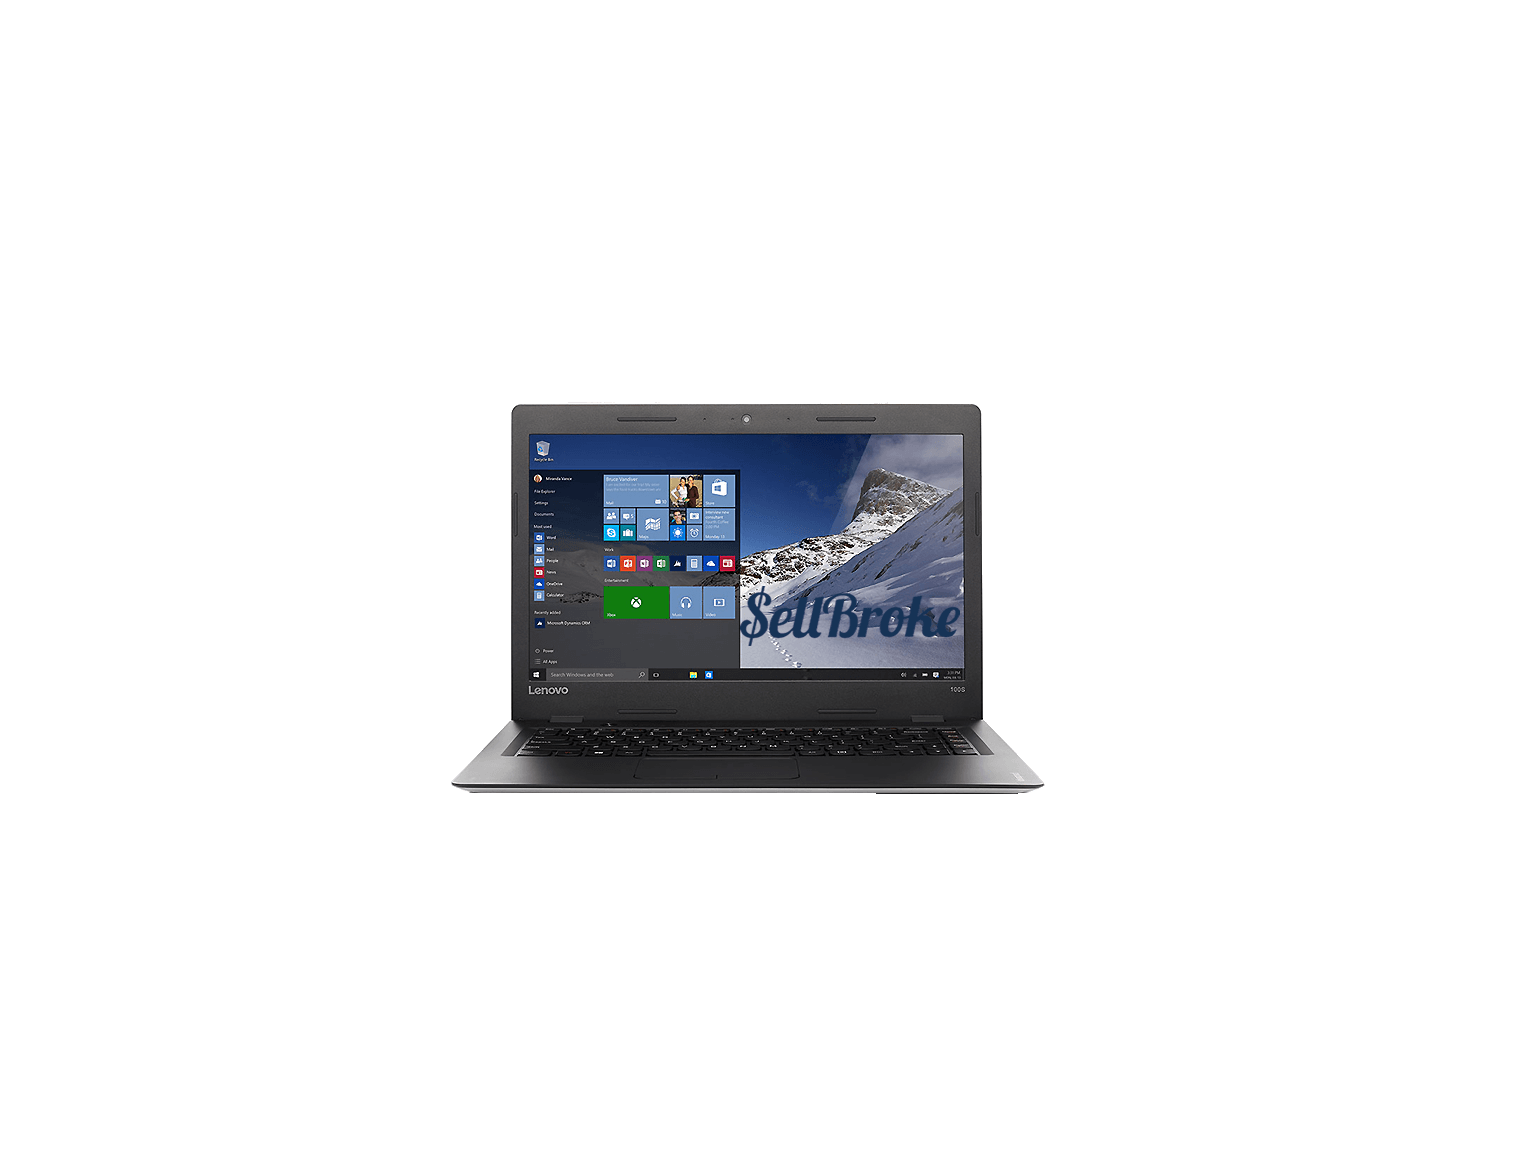 Lenovo Ideapad 100s Laptop Review   SellBroke